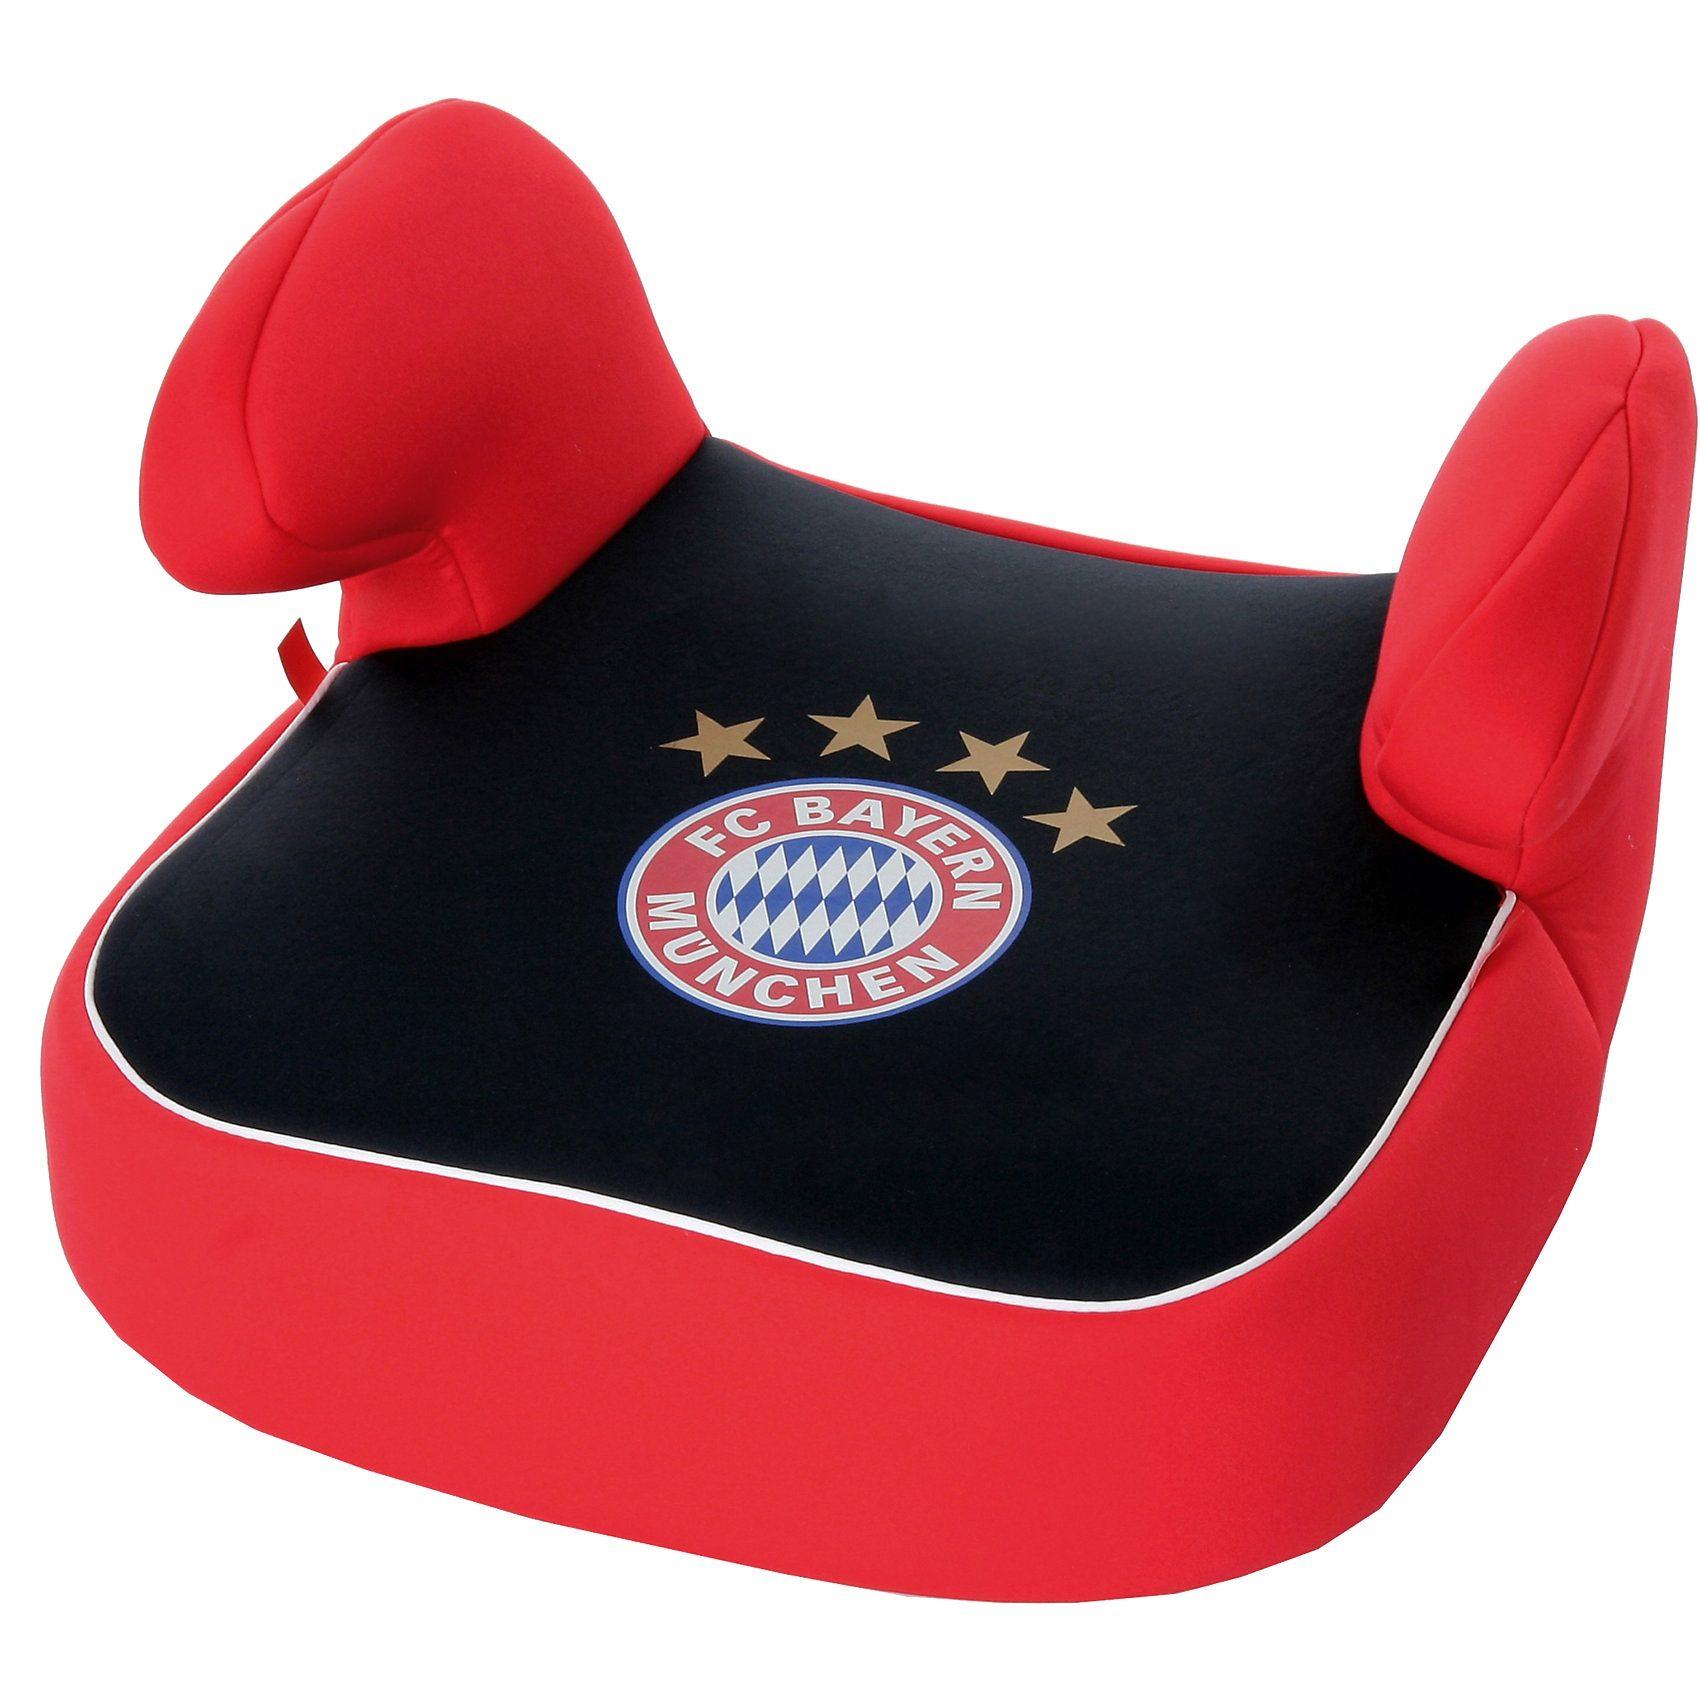 Osann Sitzerhöhung Dream Plus, FC Bayern München, 2017